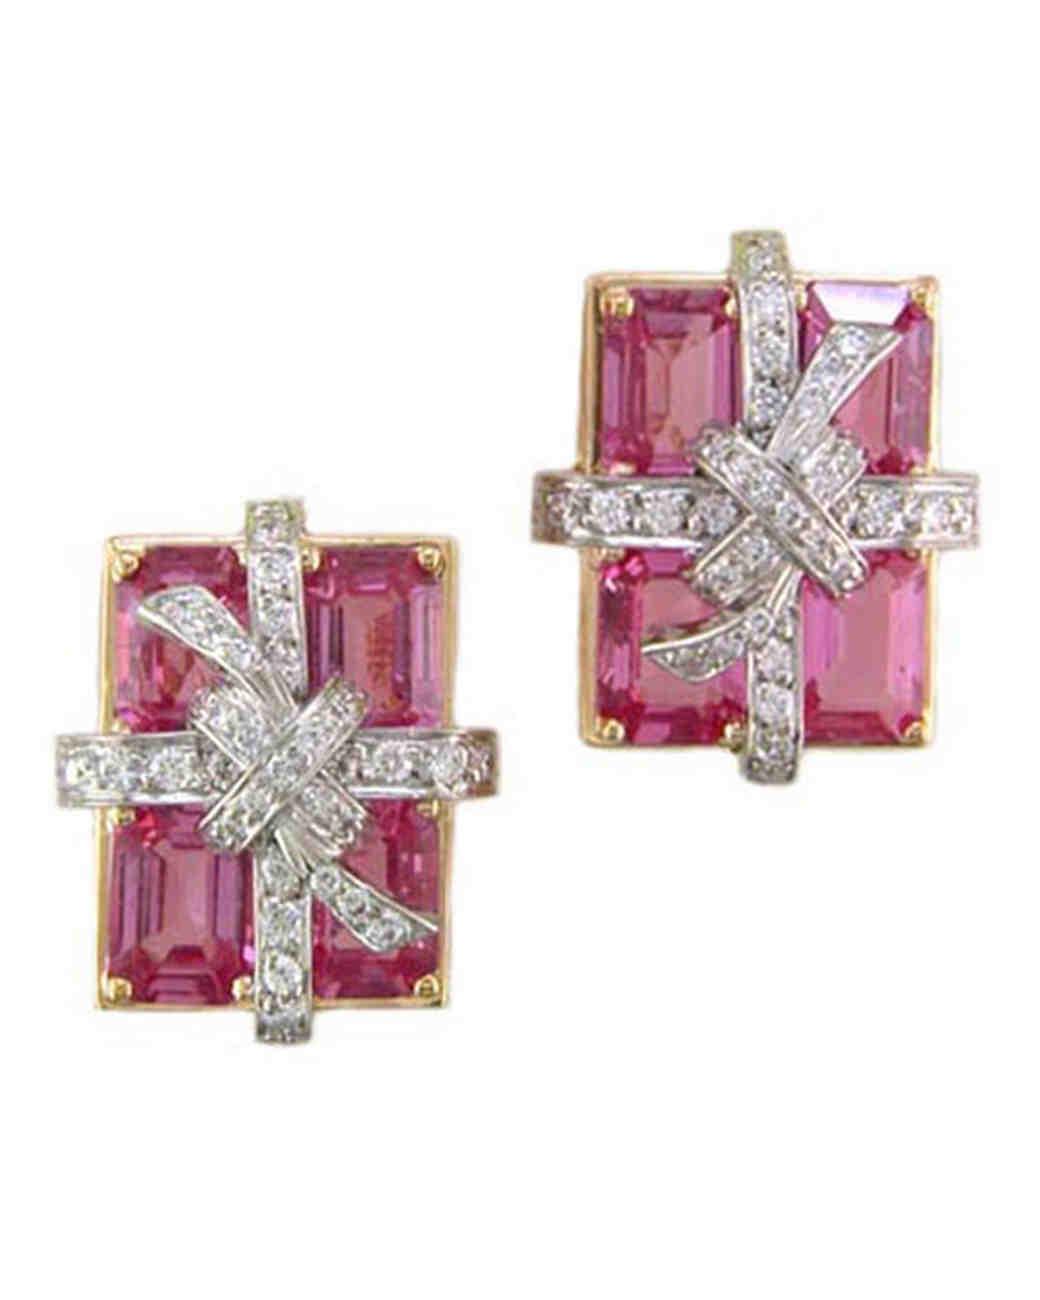 heyman_ohb_705468_xx791_gold_plat_pk_sap_dia_earrings.jpg